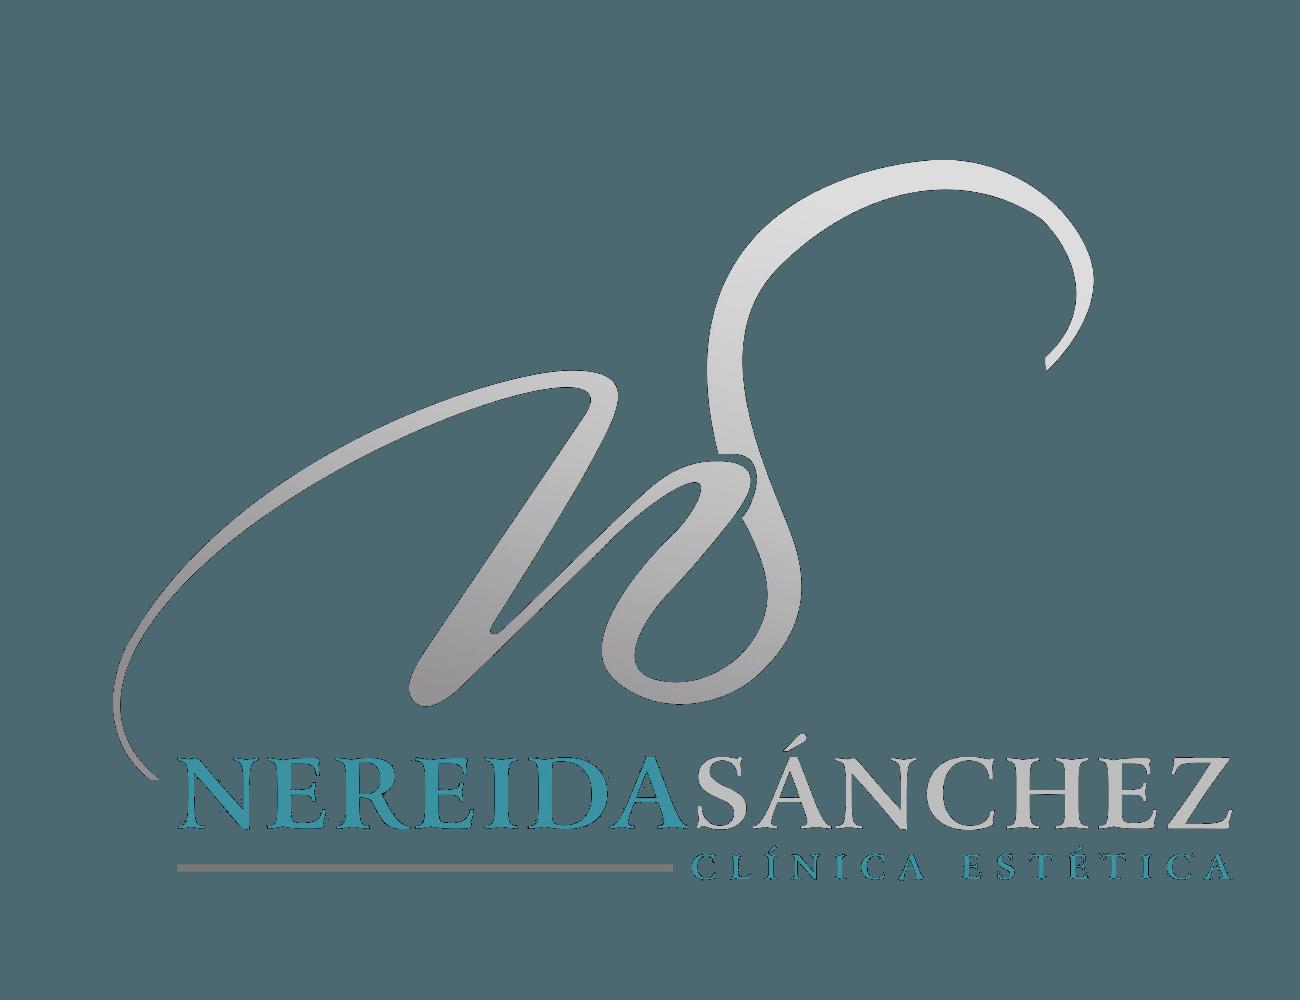 Nereida Sanchez